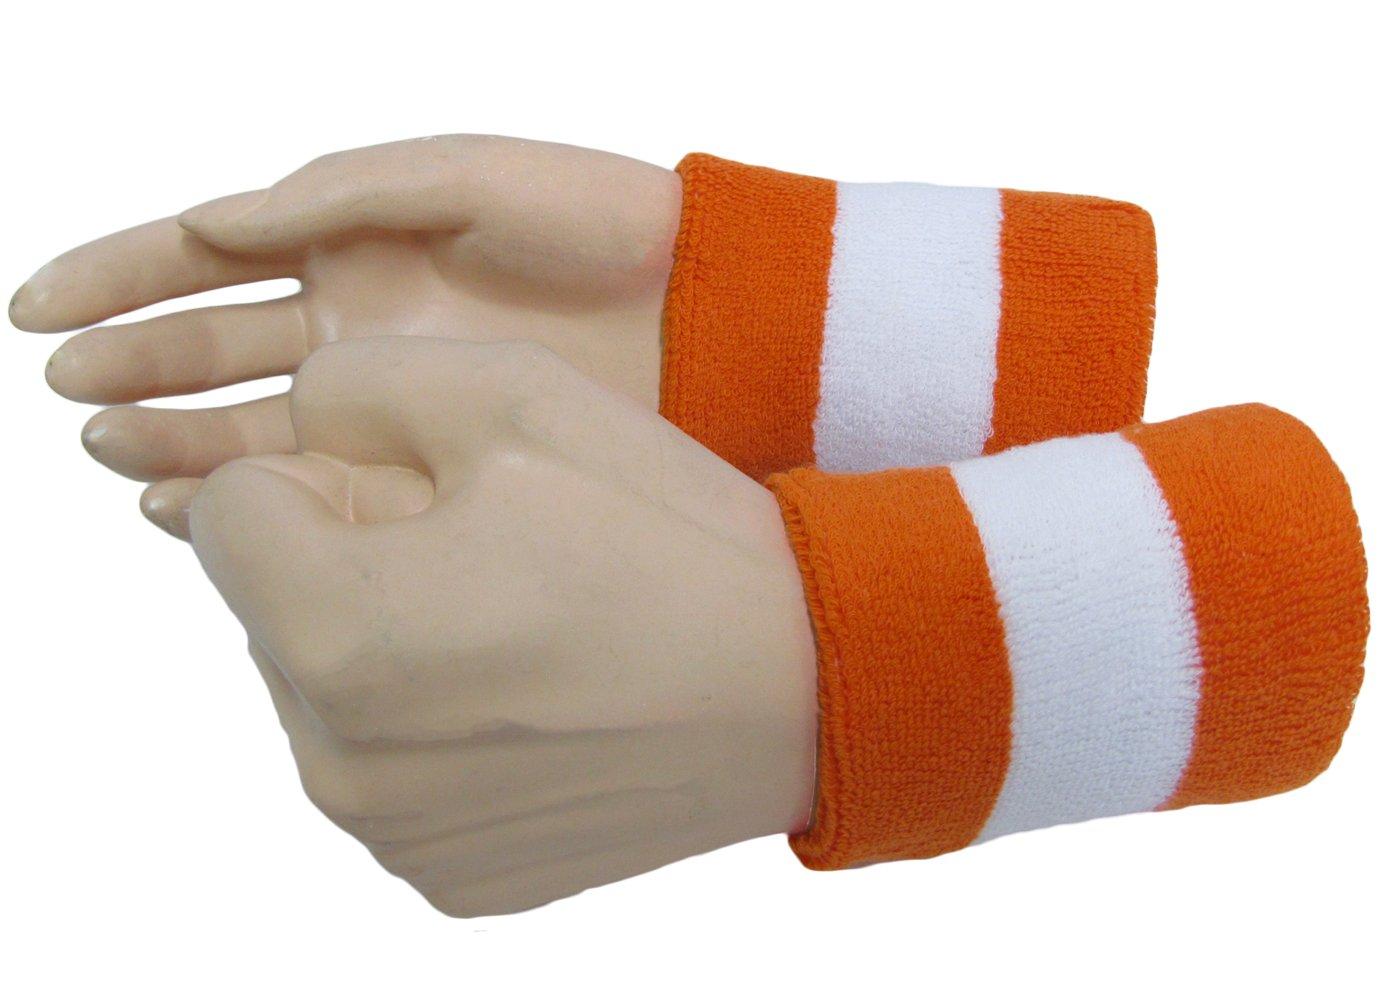 semi-pro Jackie Moon Halloweenホワイトオレンジホワイトコットンテリー布手首汗バンド   B01M01UODV